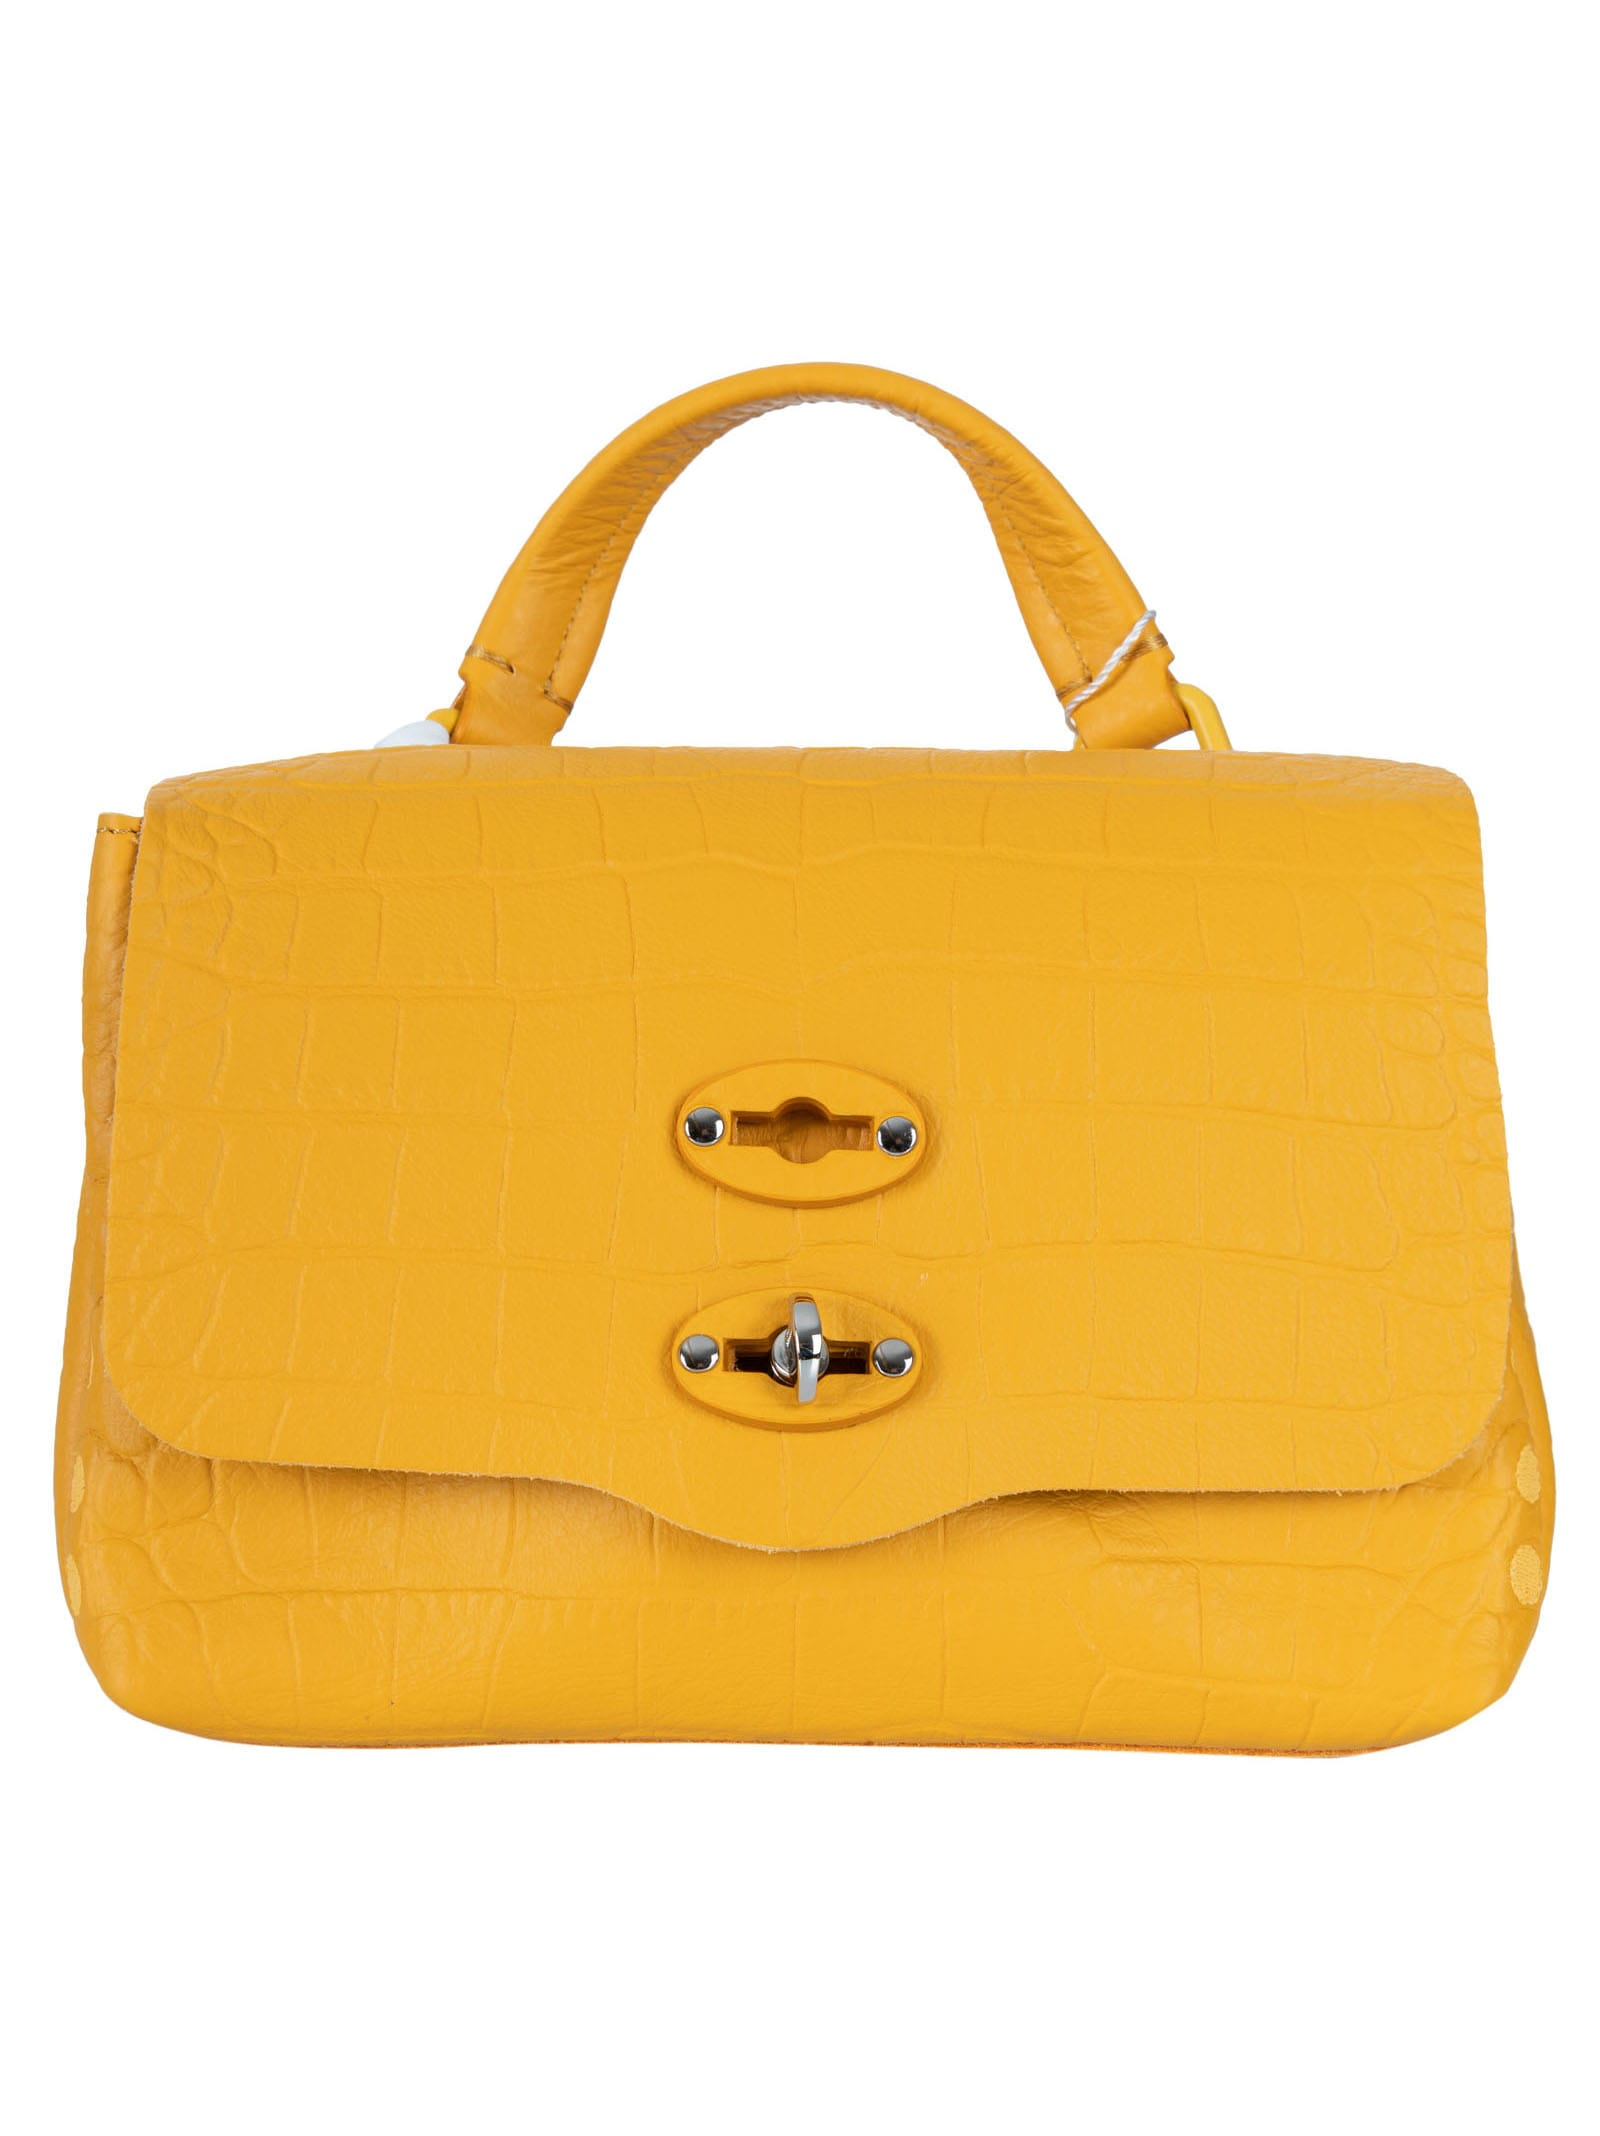 Zanellato Leathers BABY POSTINA SHOULDER BAG